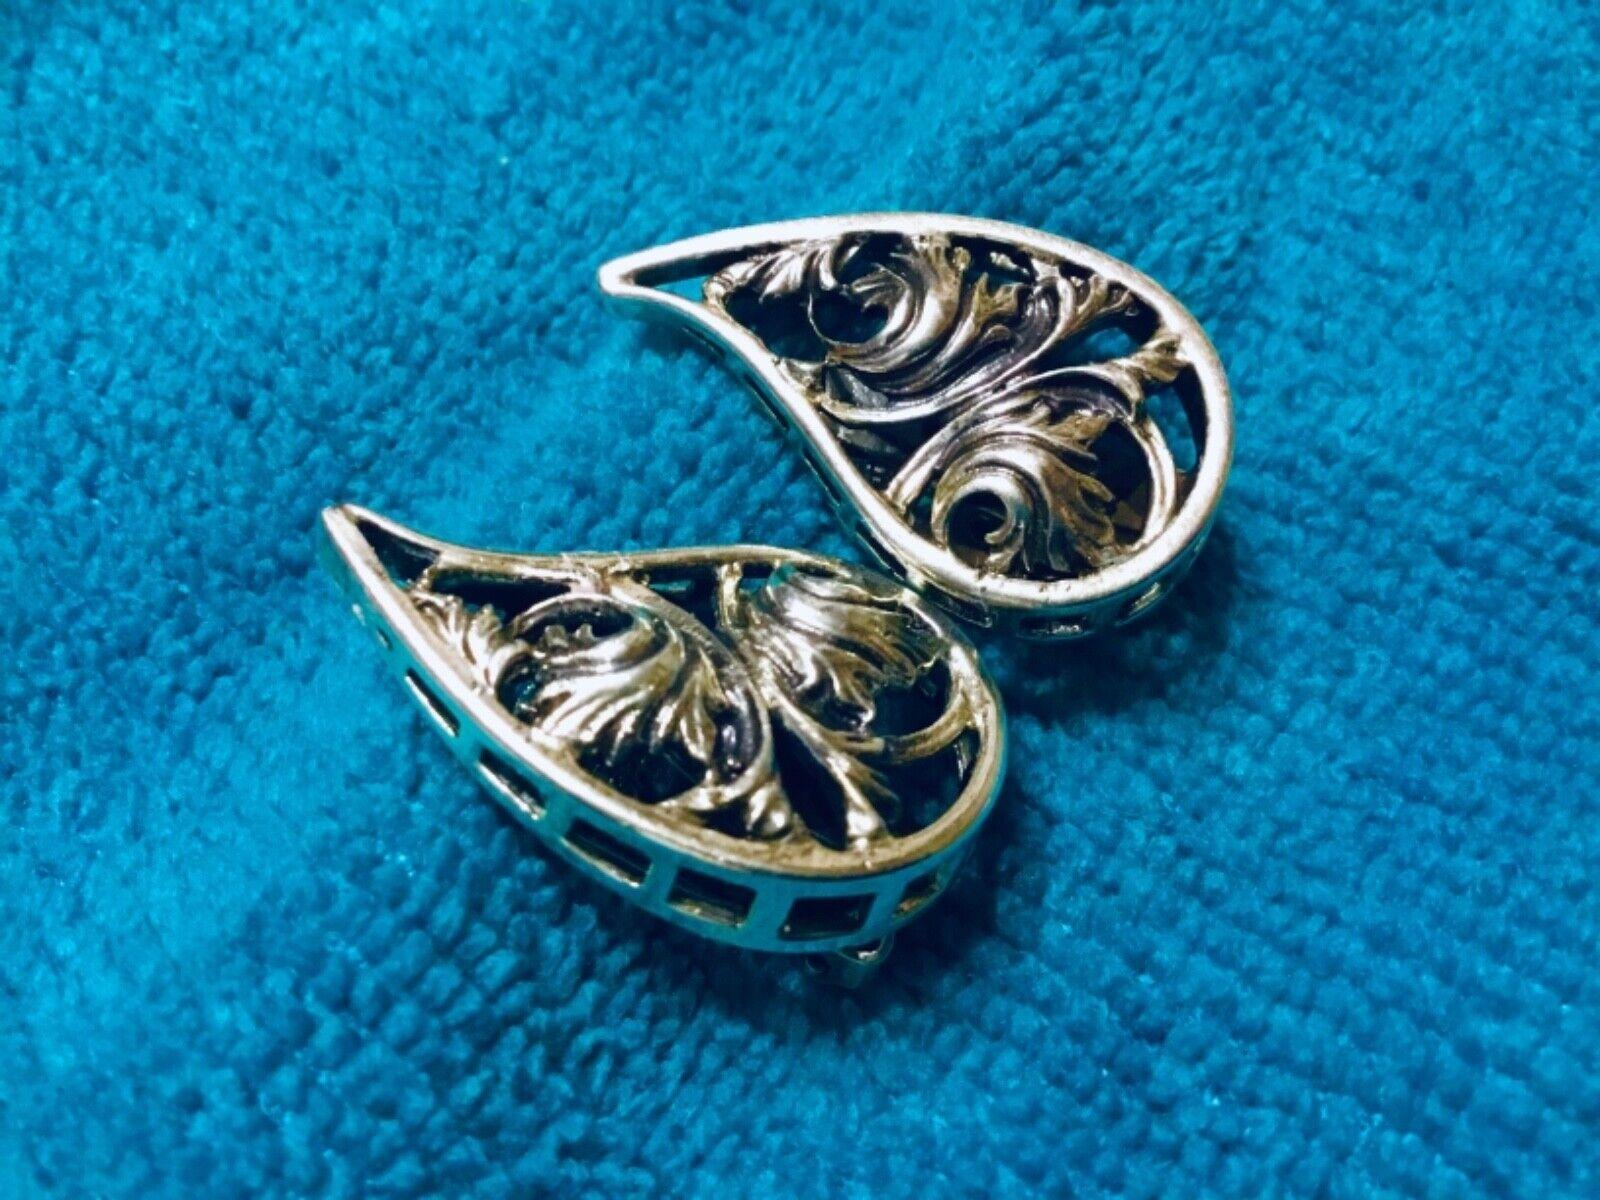 Vtg Sterling Silver Danecraft Clip earrings - image 2